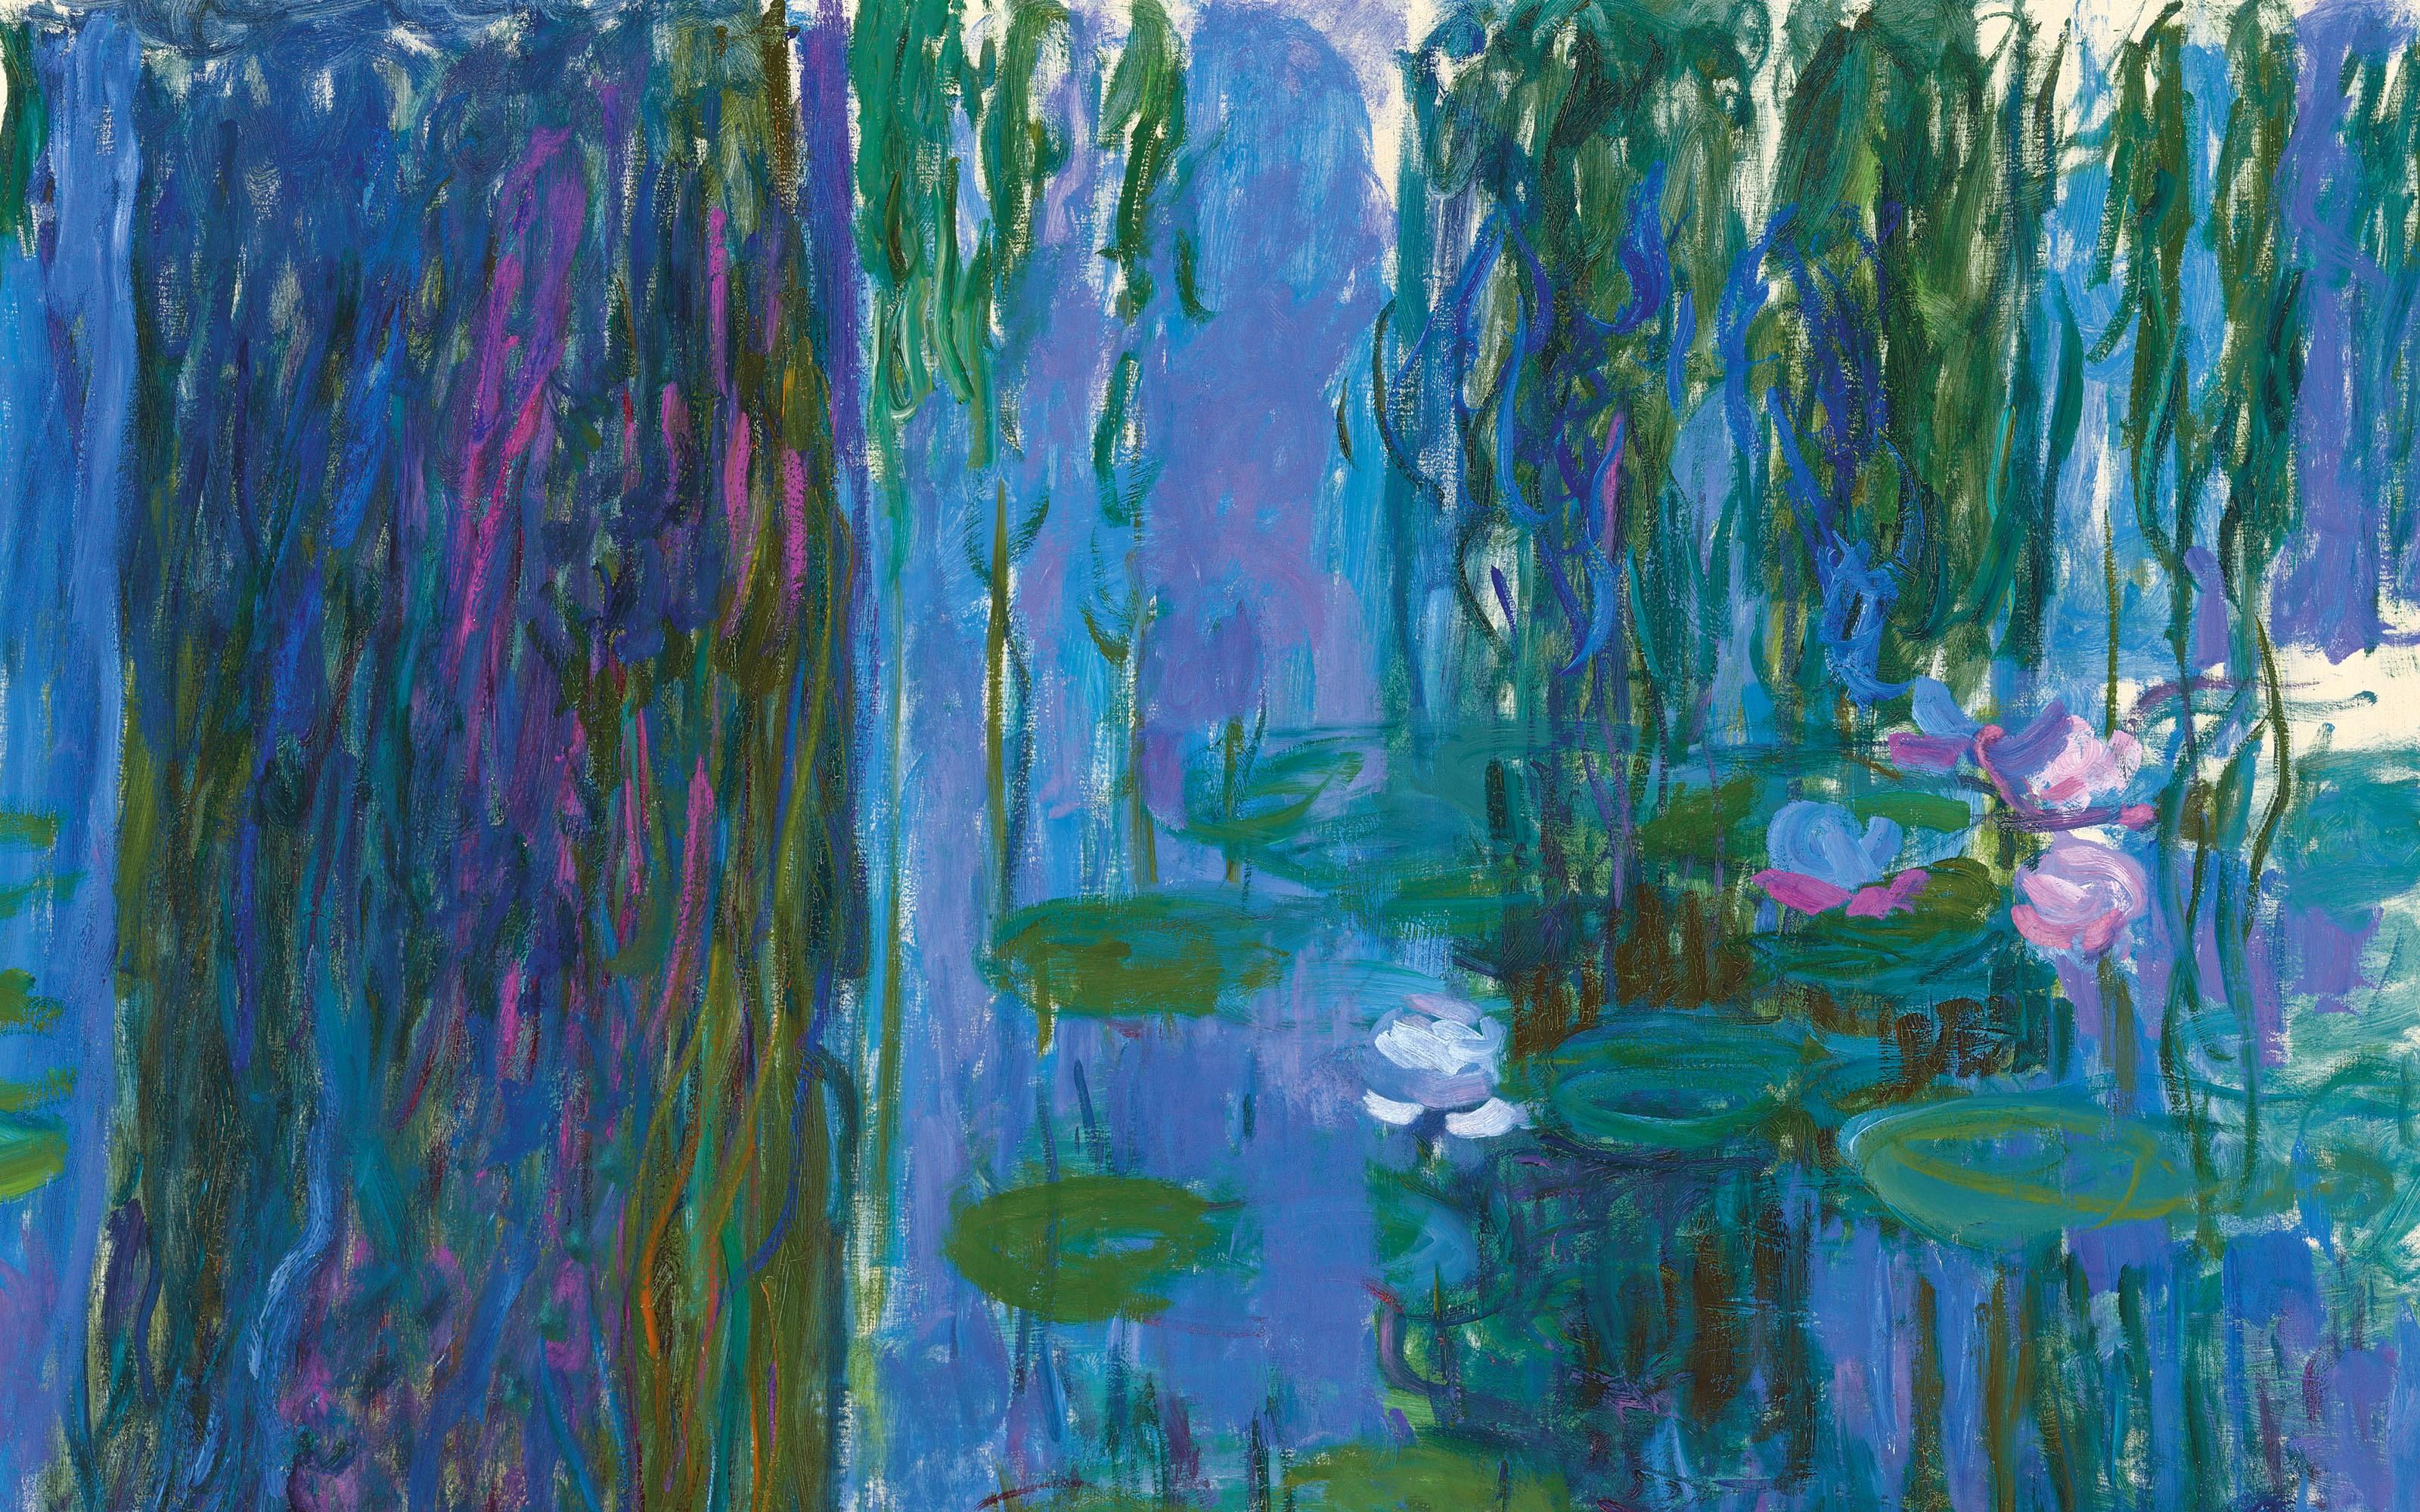 Hidden Treasures: Impressionis auction at Christies